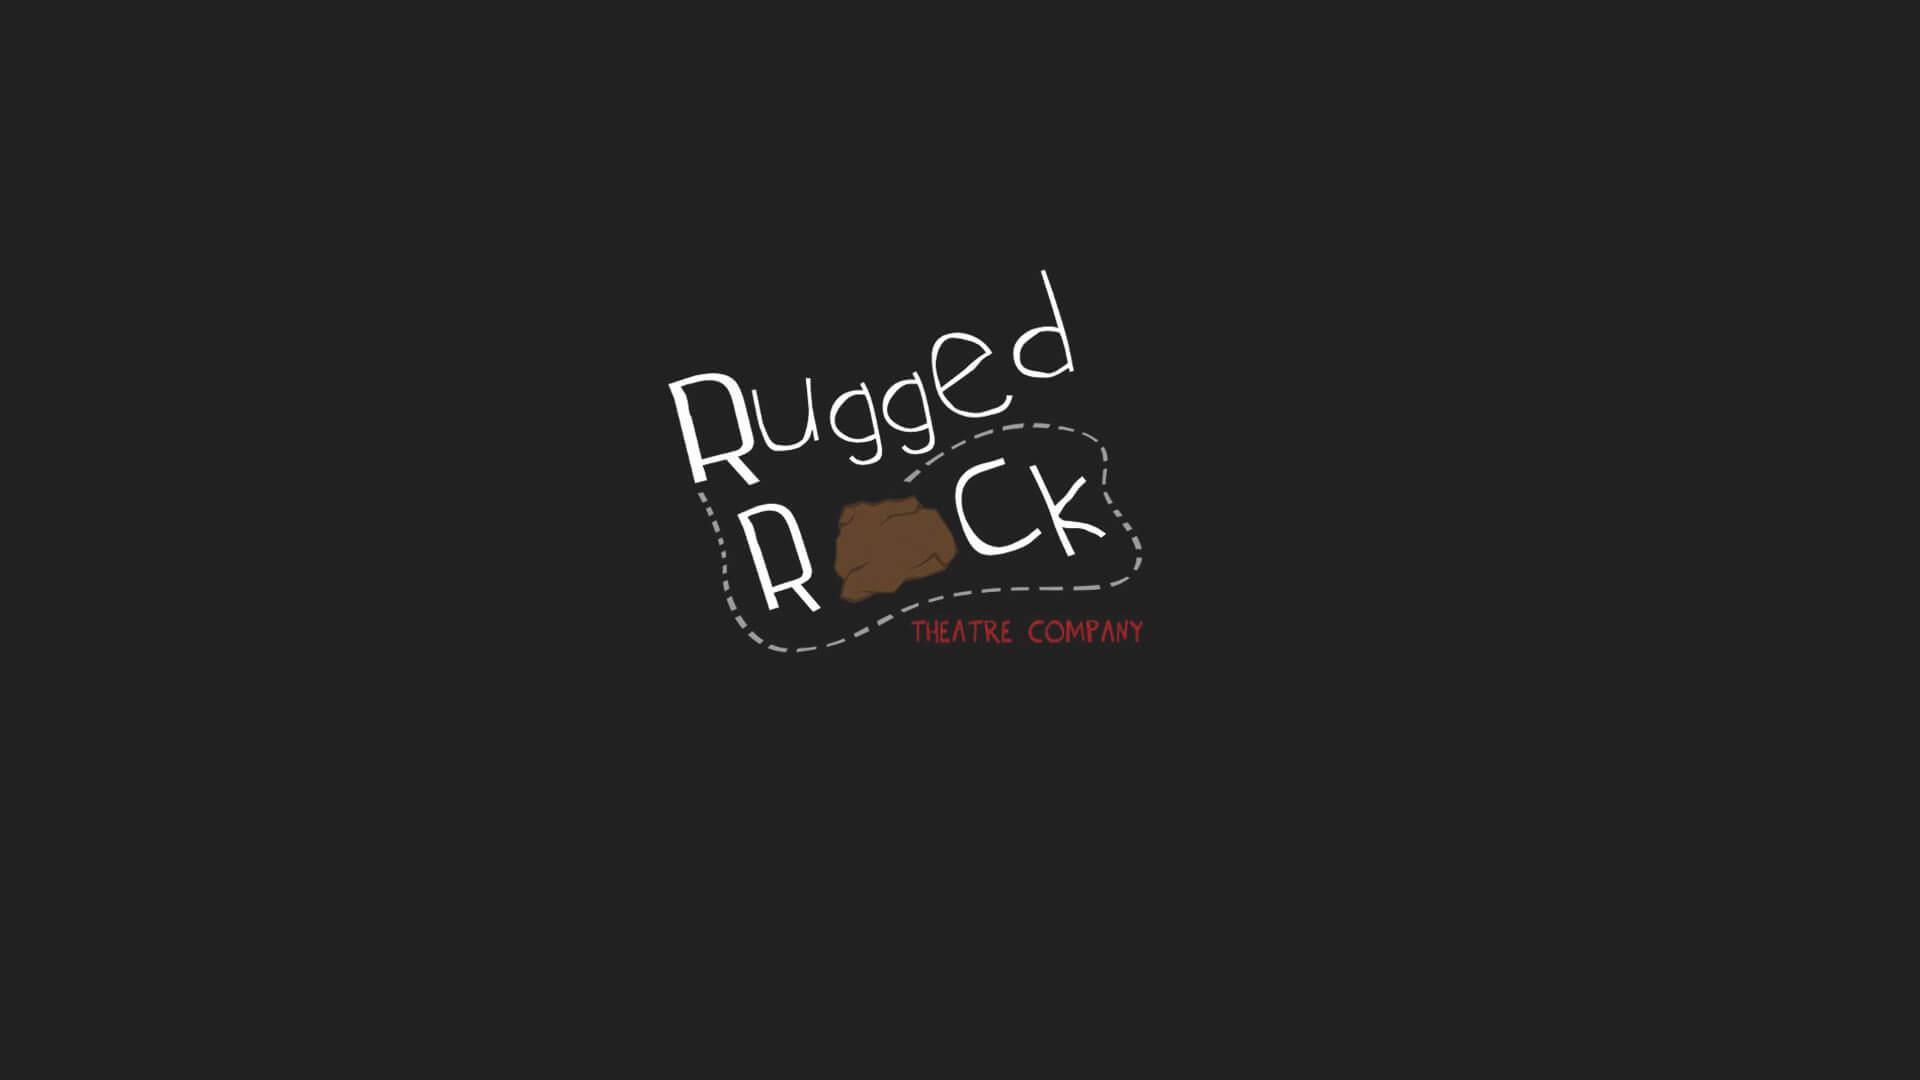 Rugged Rock